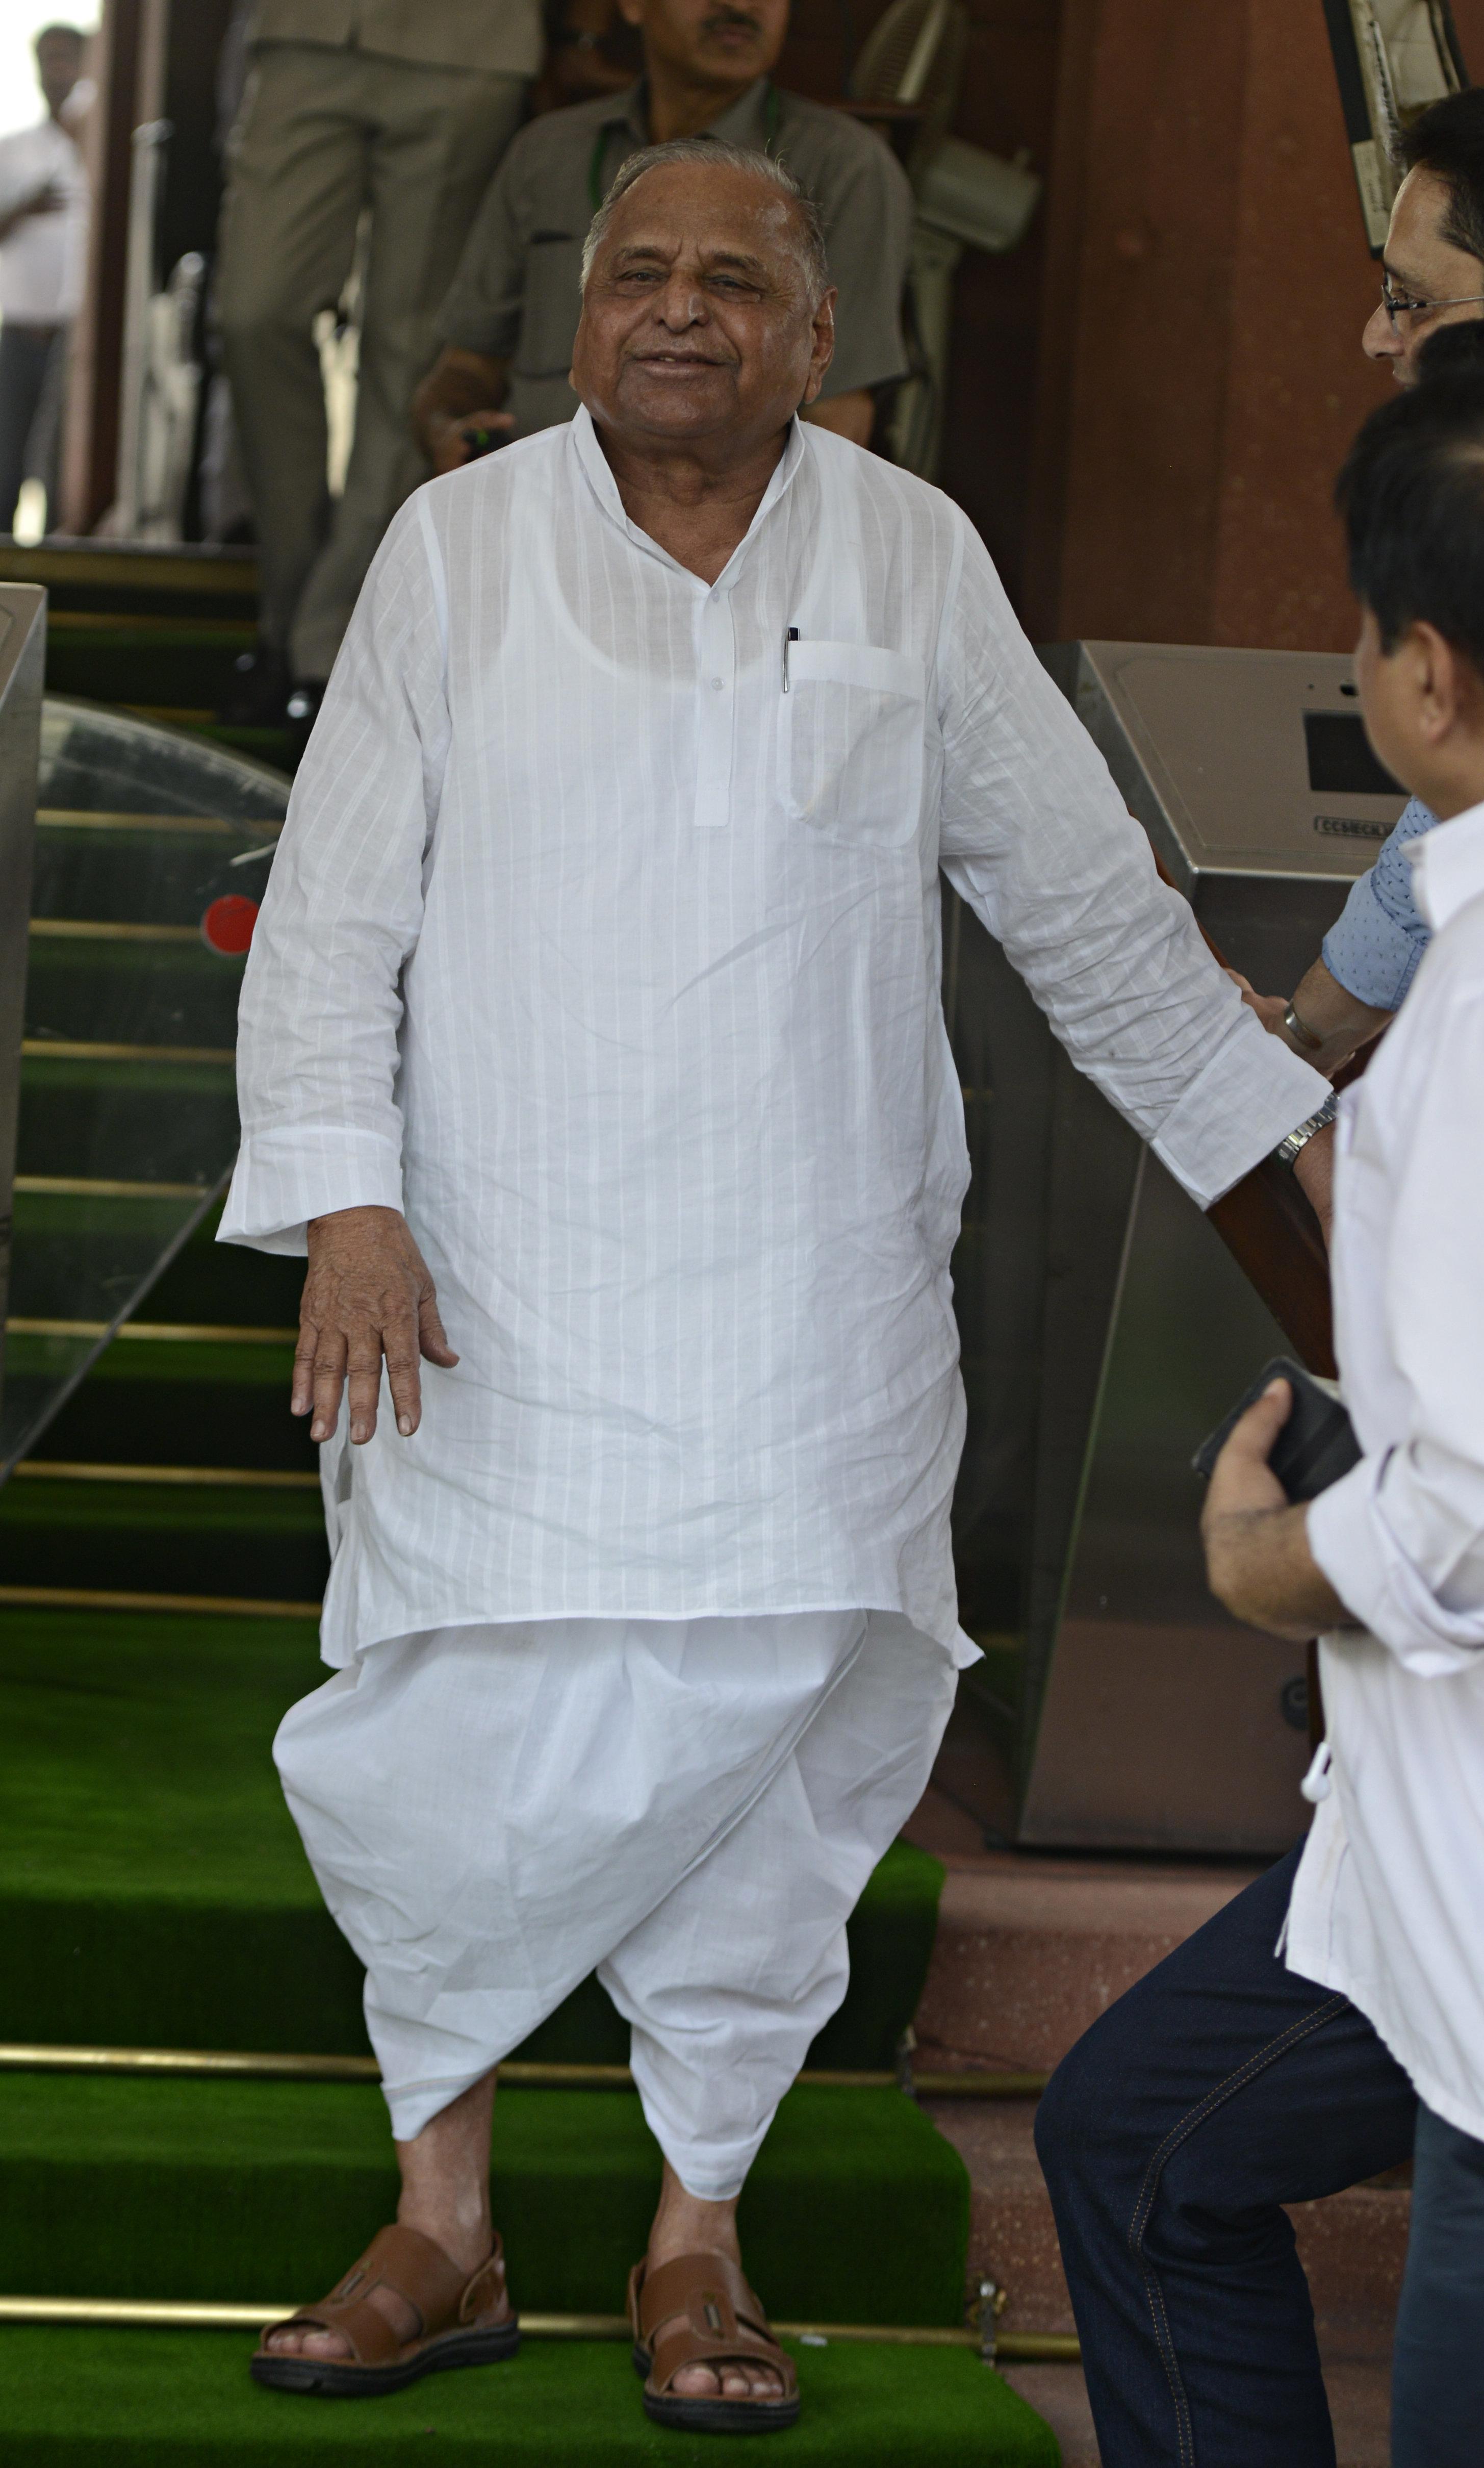 Mulayam Singh Yadav To Fight From Samajwadi Party's 'Stronghold' Mainpuri In Lok Sabha